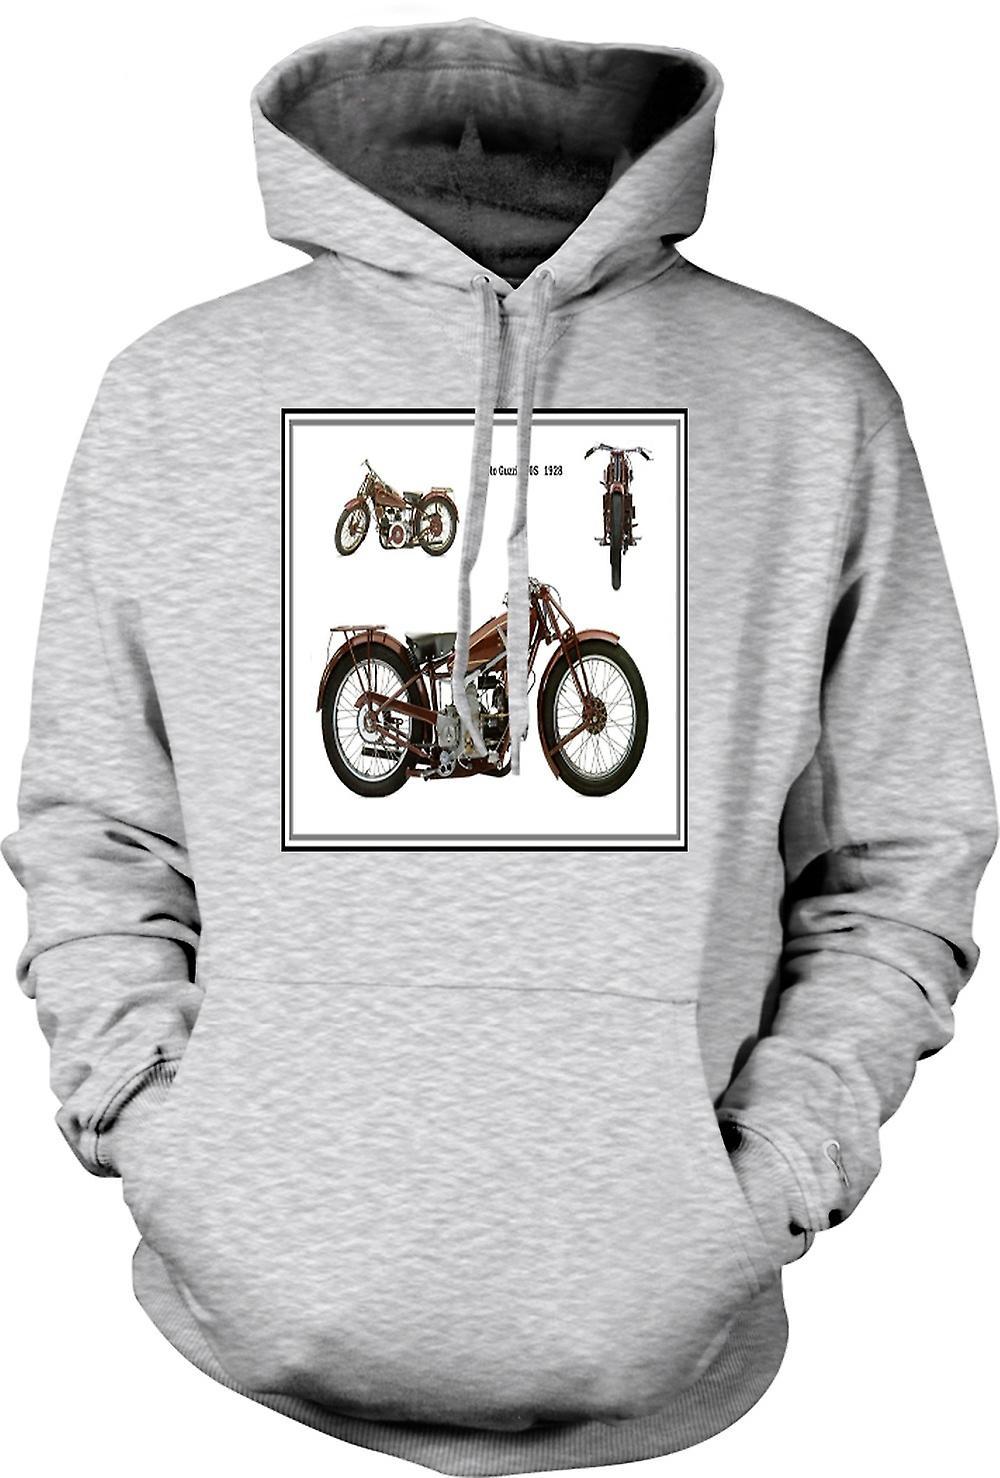 Mens Hoodie - Moto Guzzi 500S 1928 Classic Bike